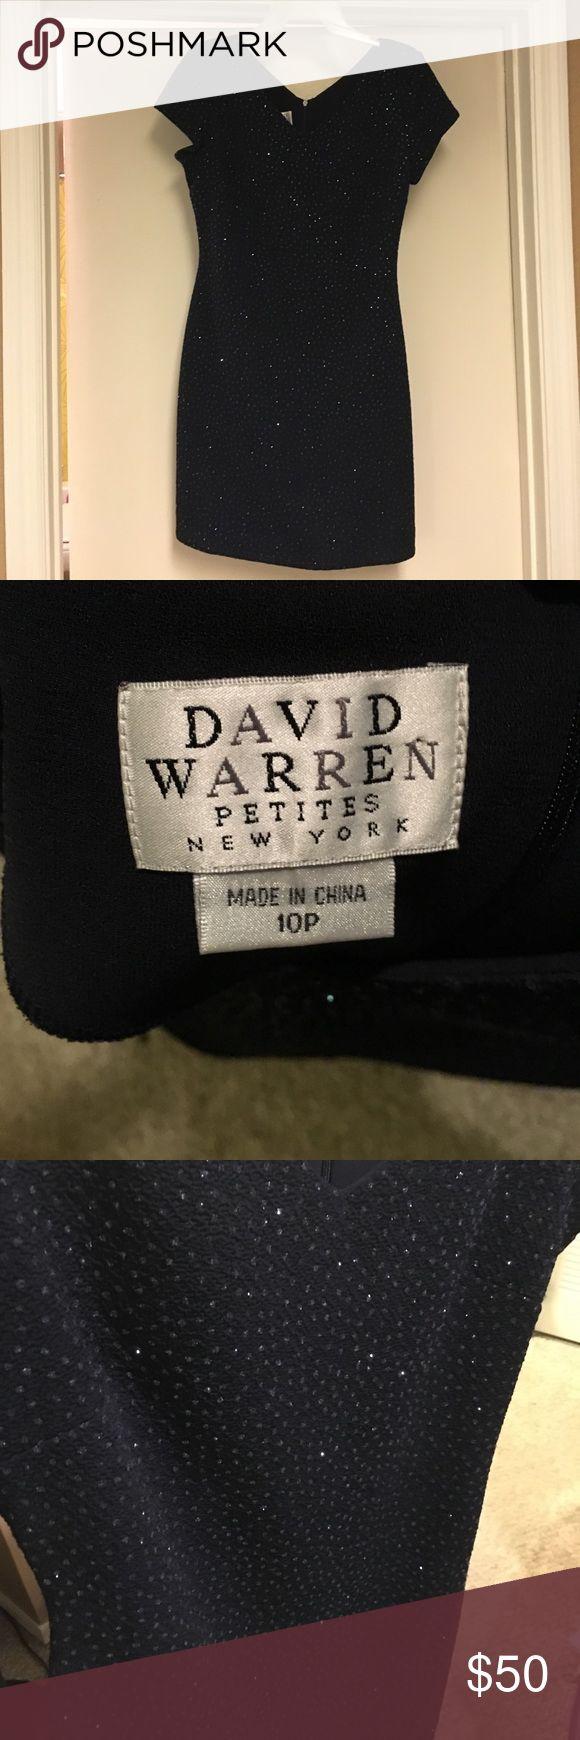 David Warren Petites Cocktail dress Dark navy, embroidered sequins, with flattering cut. Hemmed Zipper on back. Small split on back side. david warren Dresses Midi